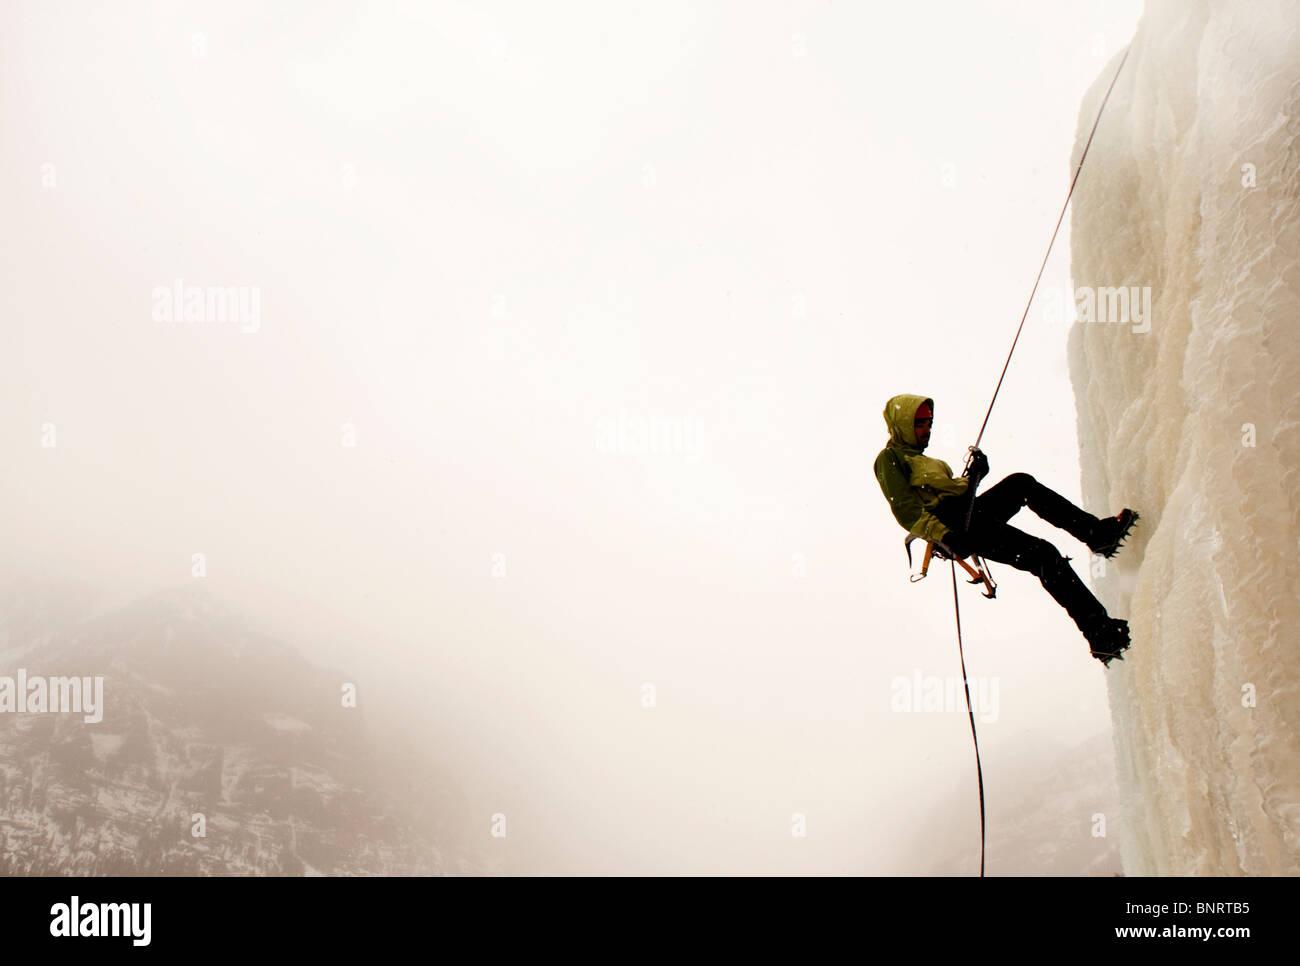 Un hombre de escalada en hielo. Imagen De Stock